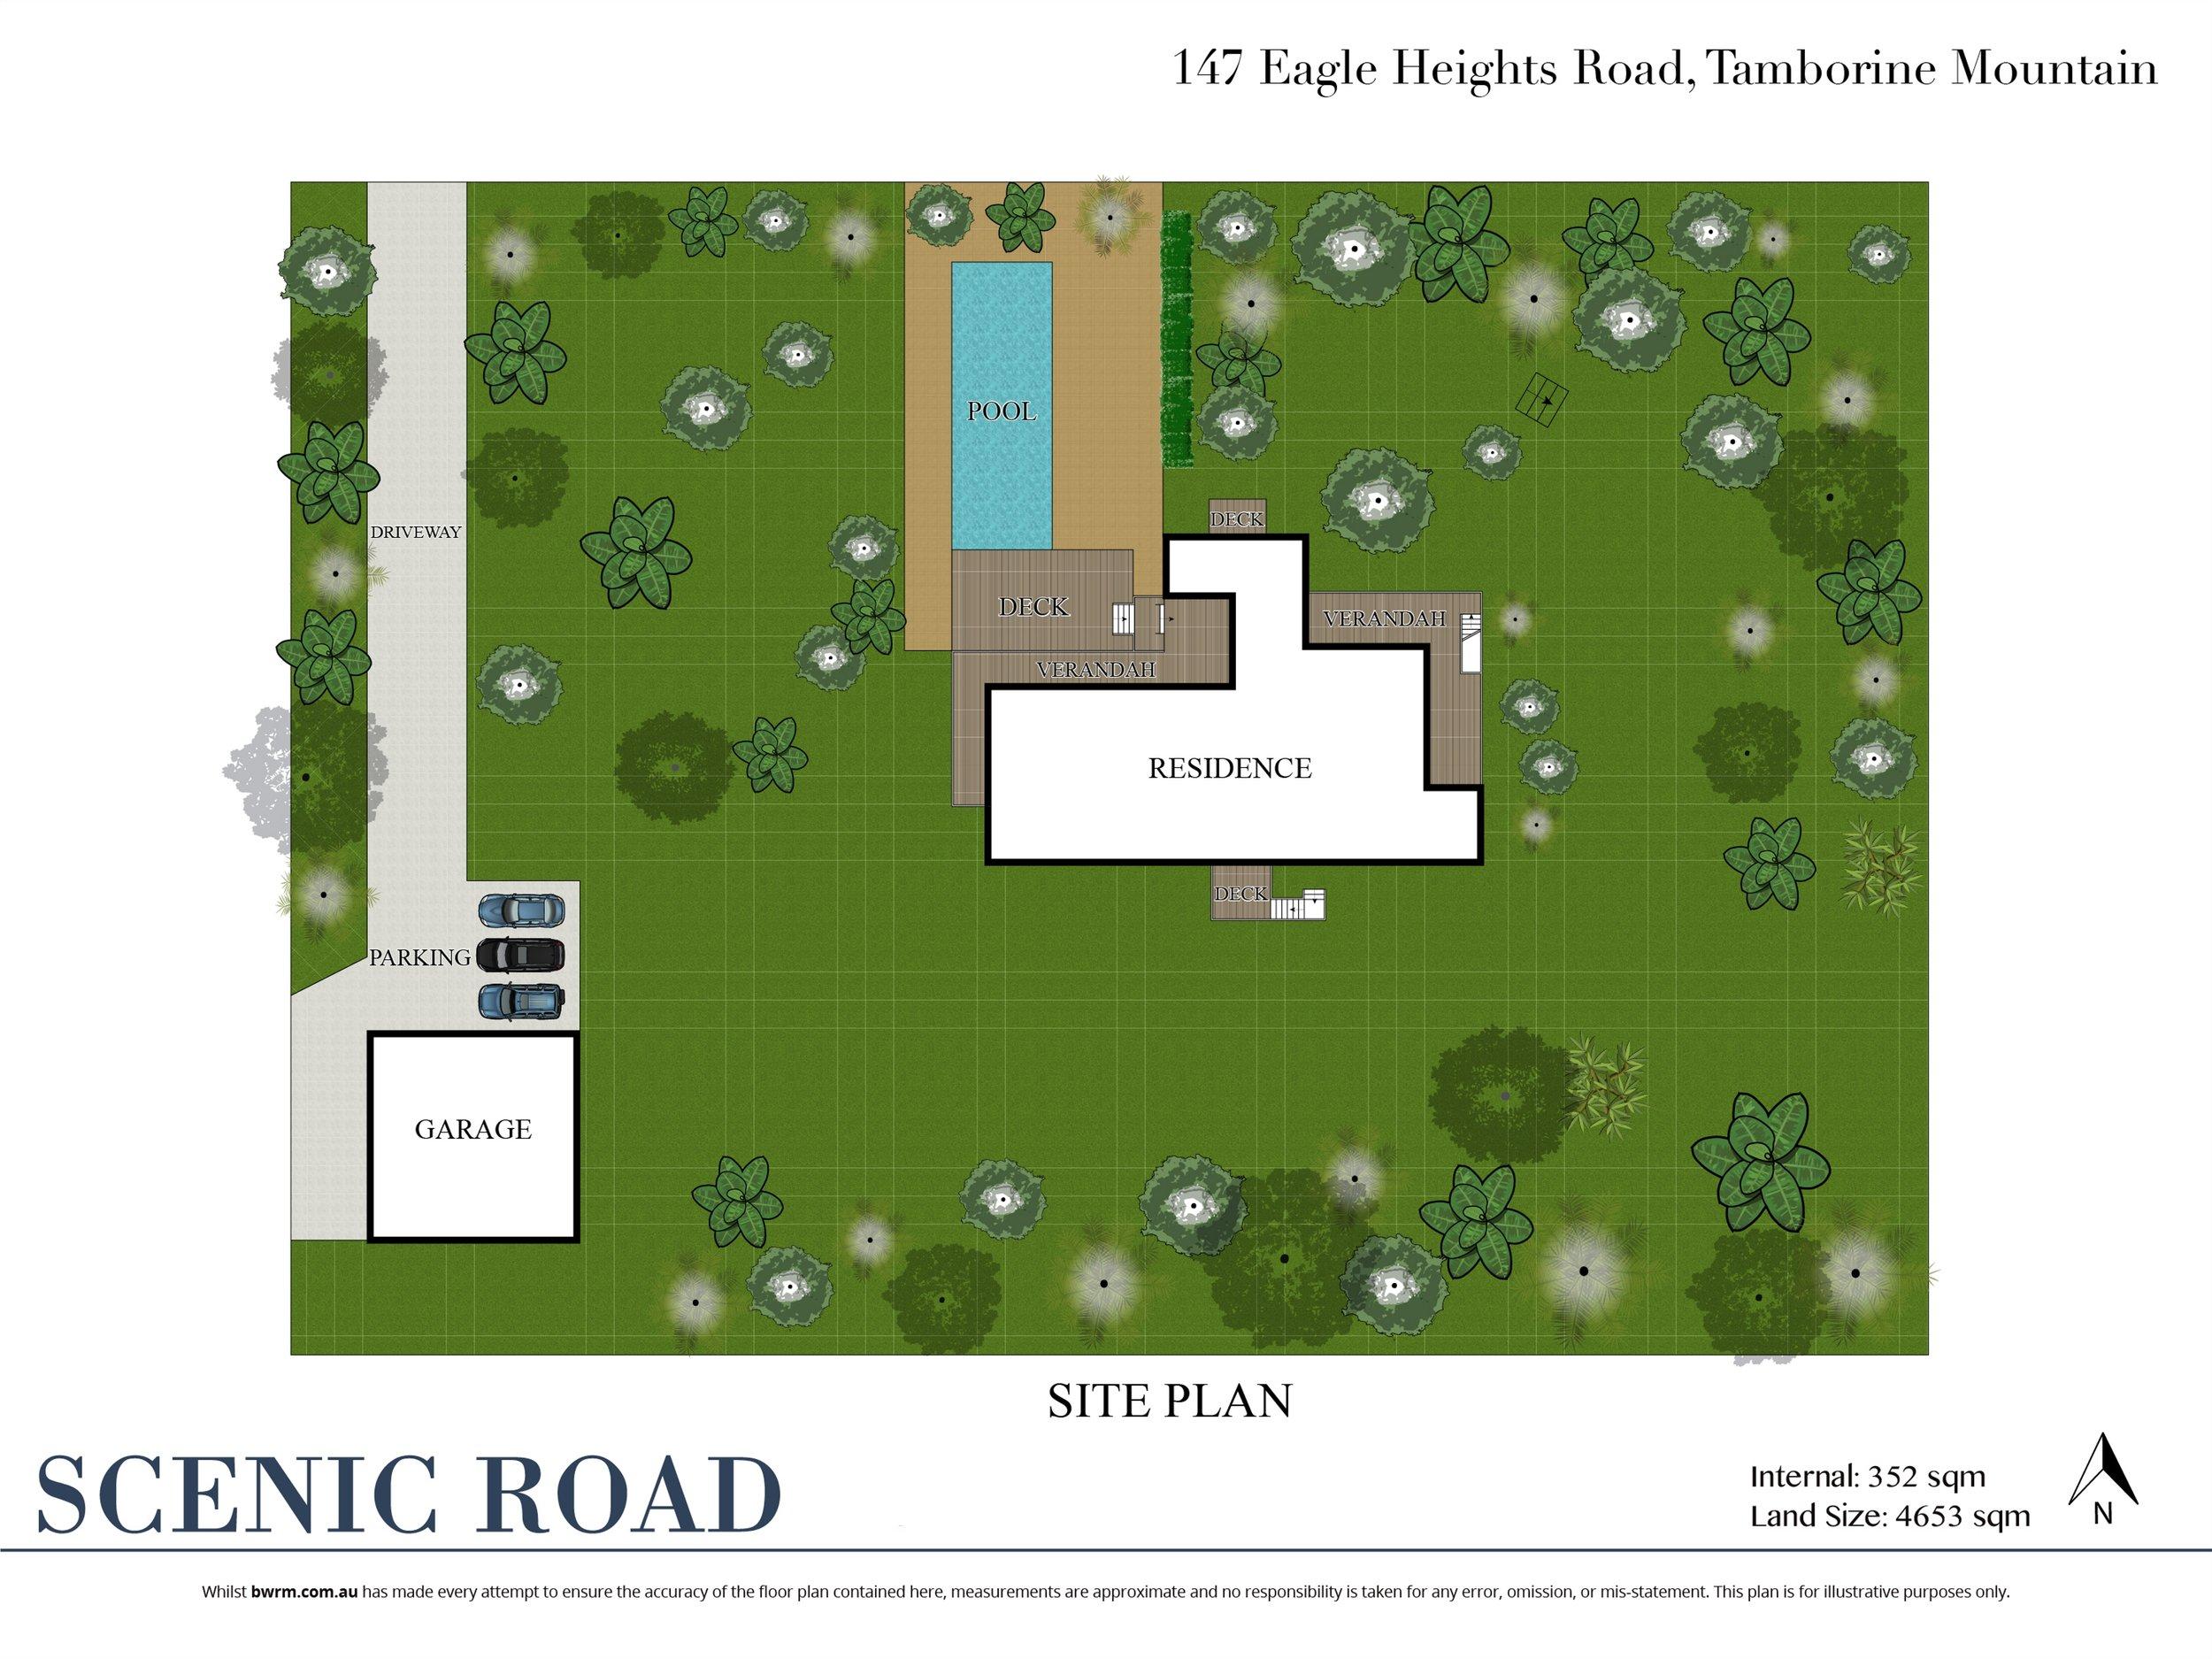 PRINT_147_Eagle_Heights_Road__Tamborine_Mountain_SP_5.jpg